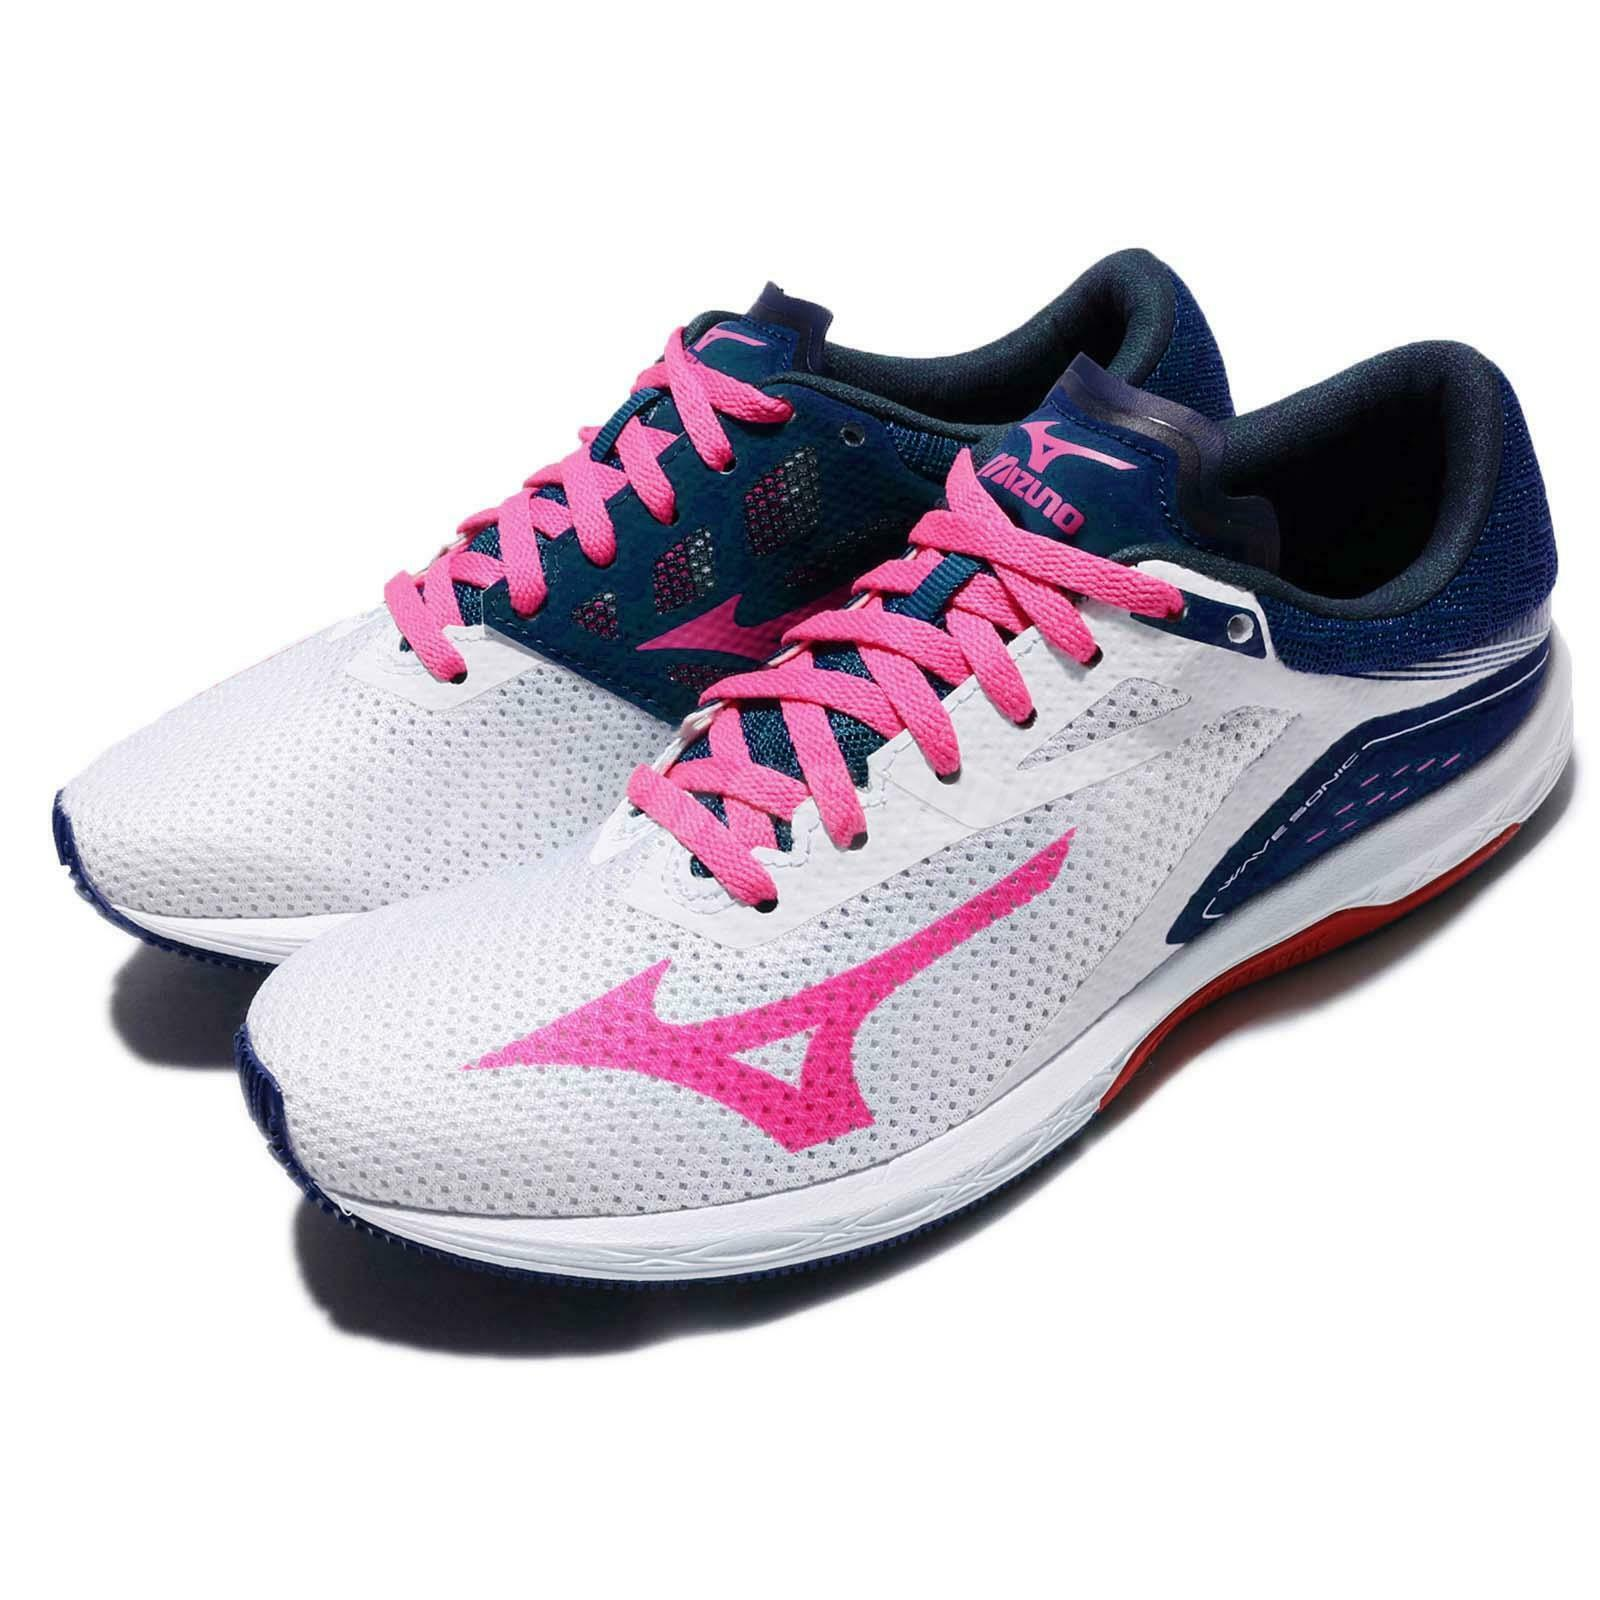 Mizuno Wave Sonic White Pink bluee Women Running shoes Sneakers J1GD1734-63